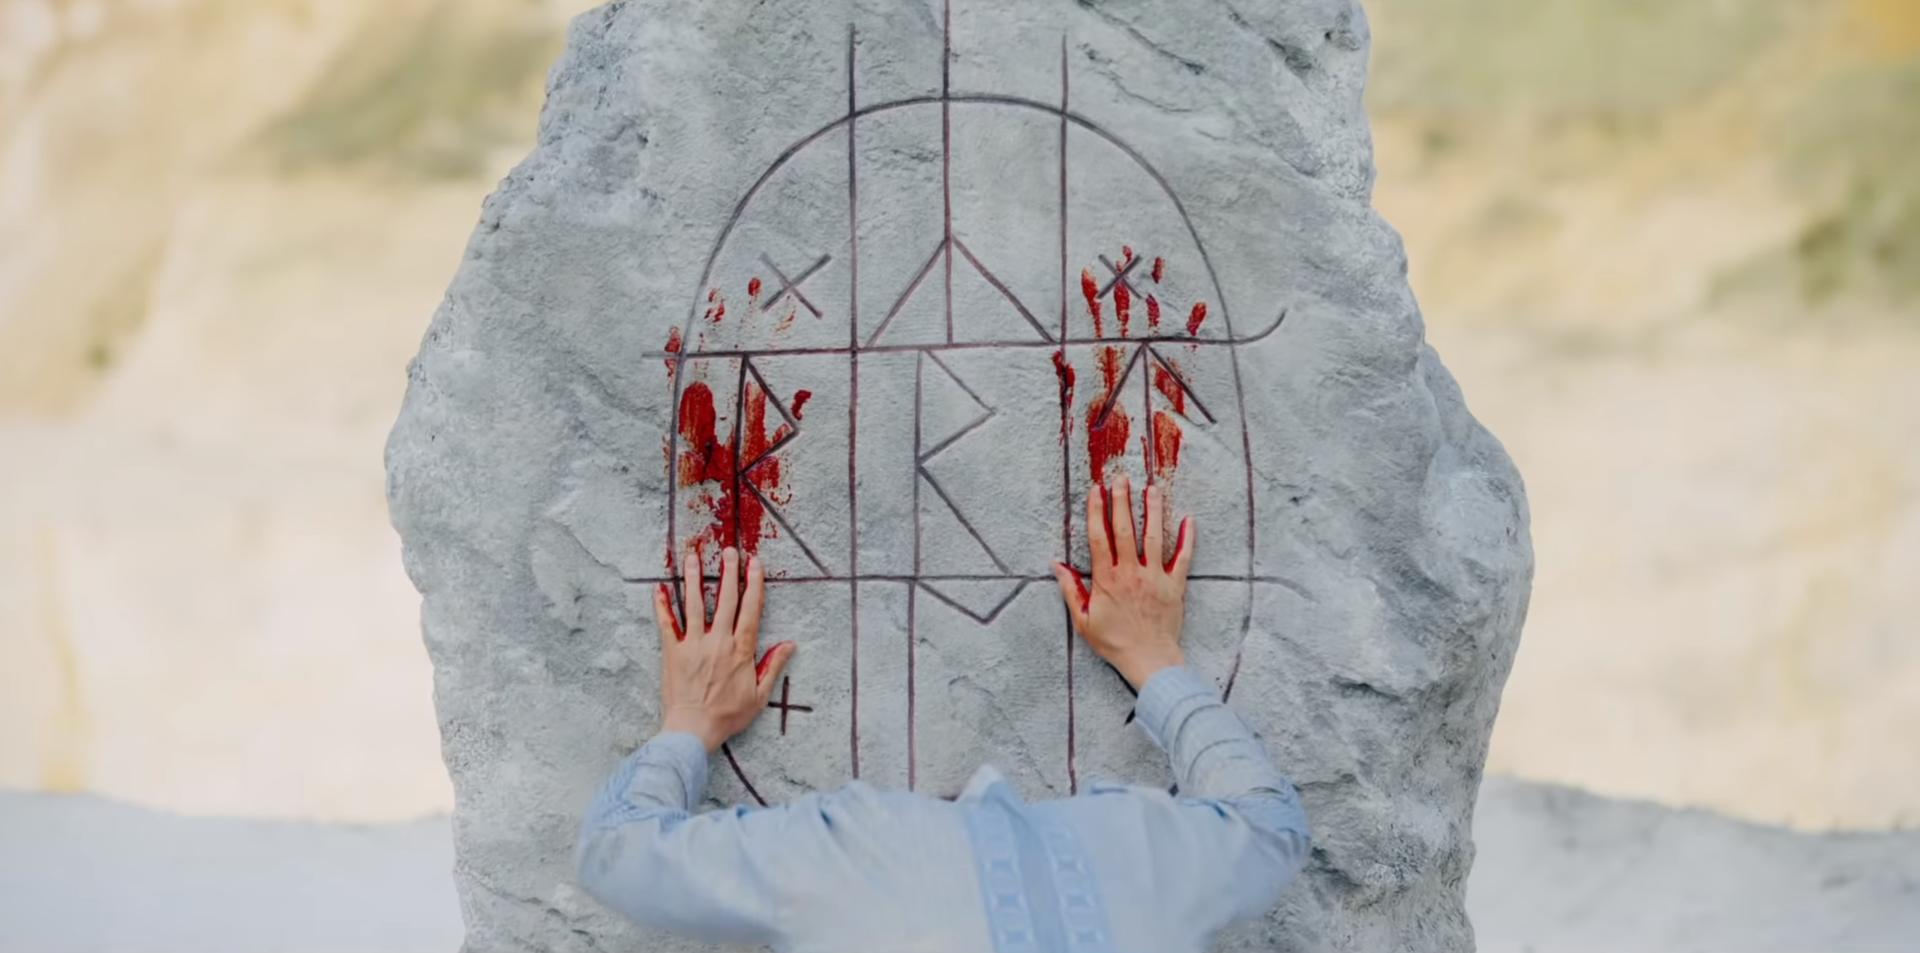 «Midsommar»: Θα ξεπεράσει ο Ari Aster το έπος του «Ηereditary» στη νέα του ταινία;